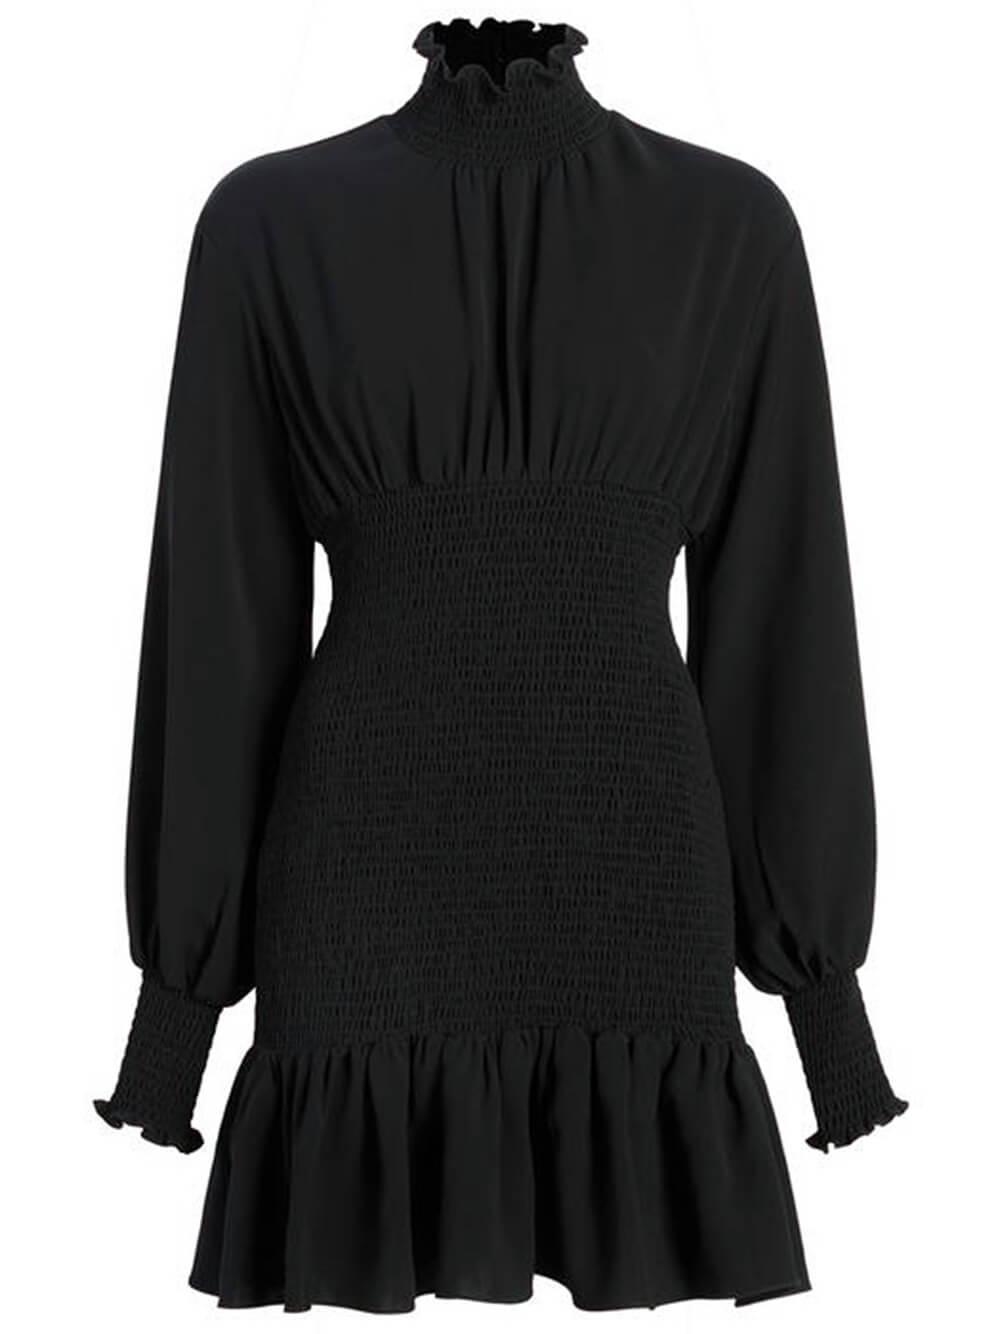 Kara Ruffle Turtleneck Dress Item # ZD14381319Z